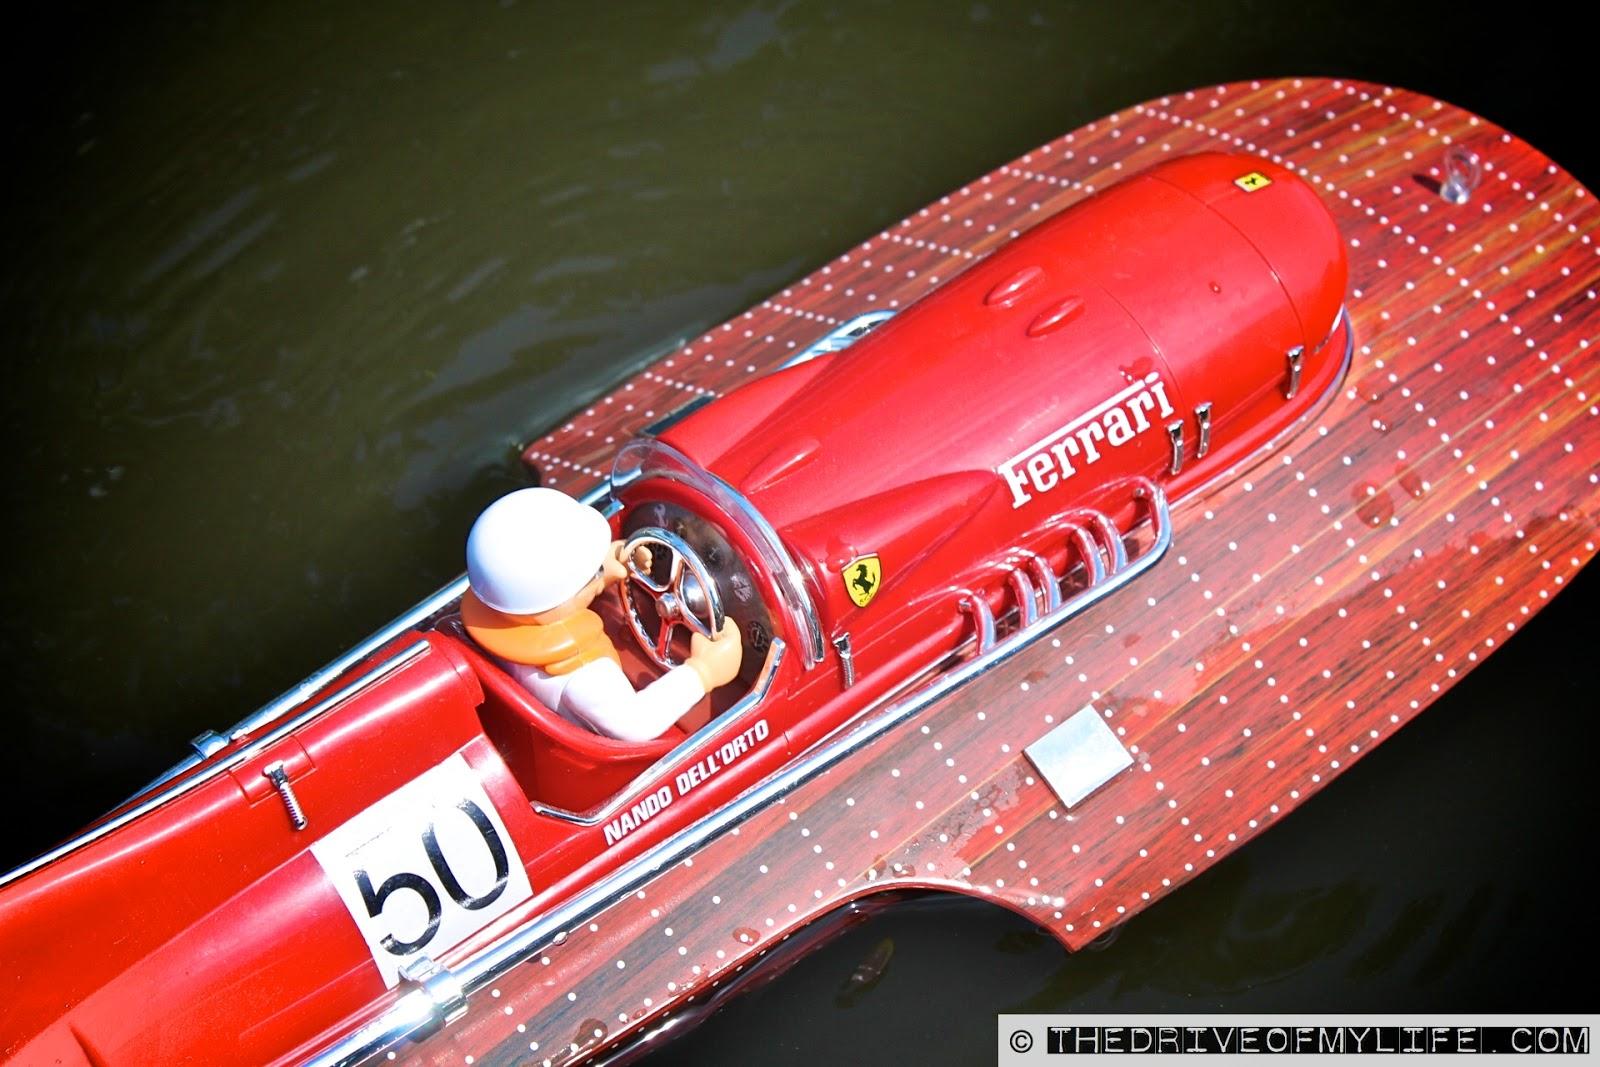 Rc+Hydroplane+Boat+Plans Rc Hydroplane Boat Plans Ajilbabcom Portal